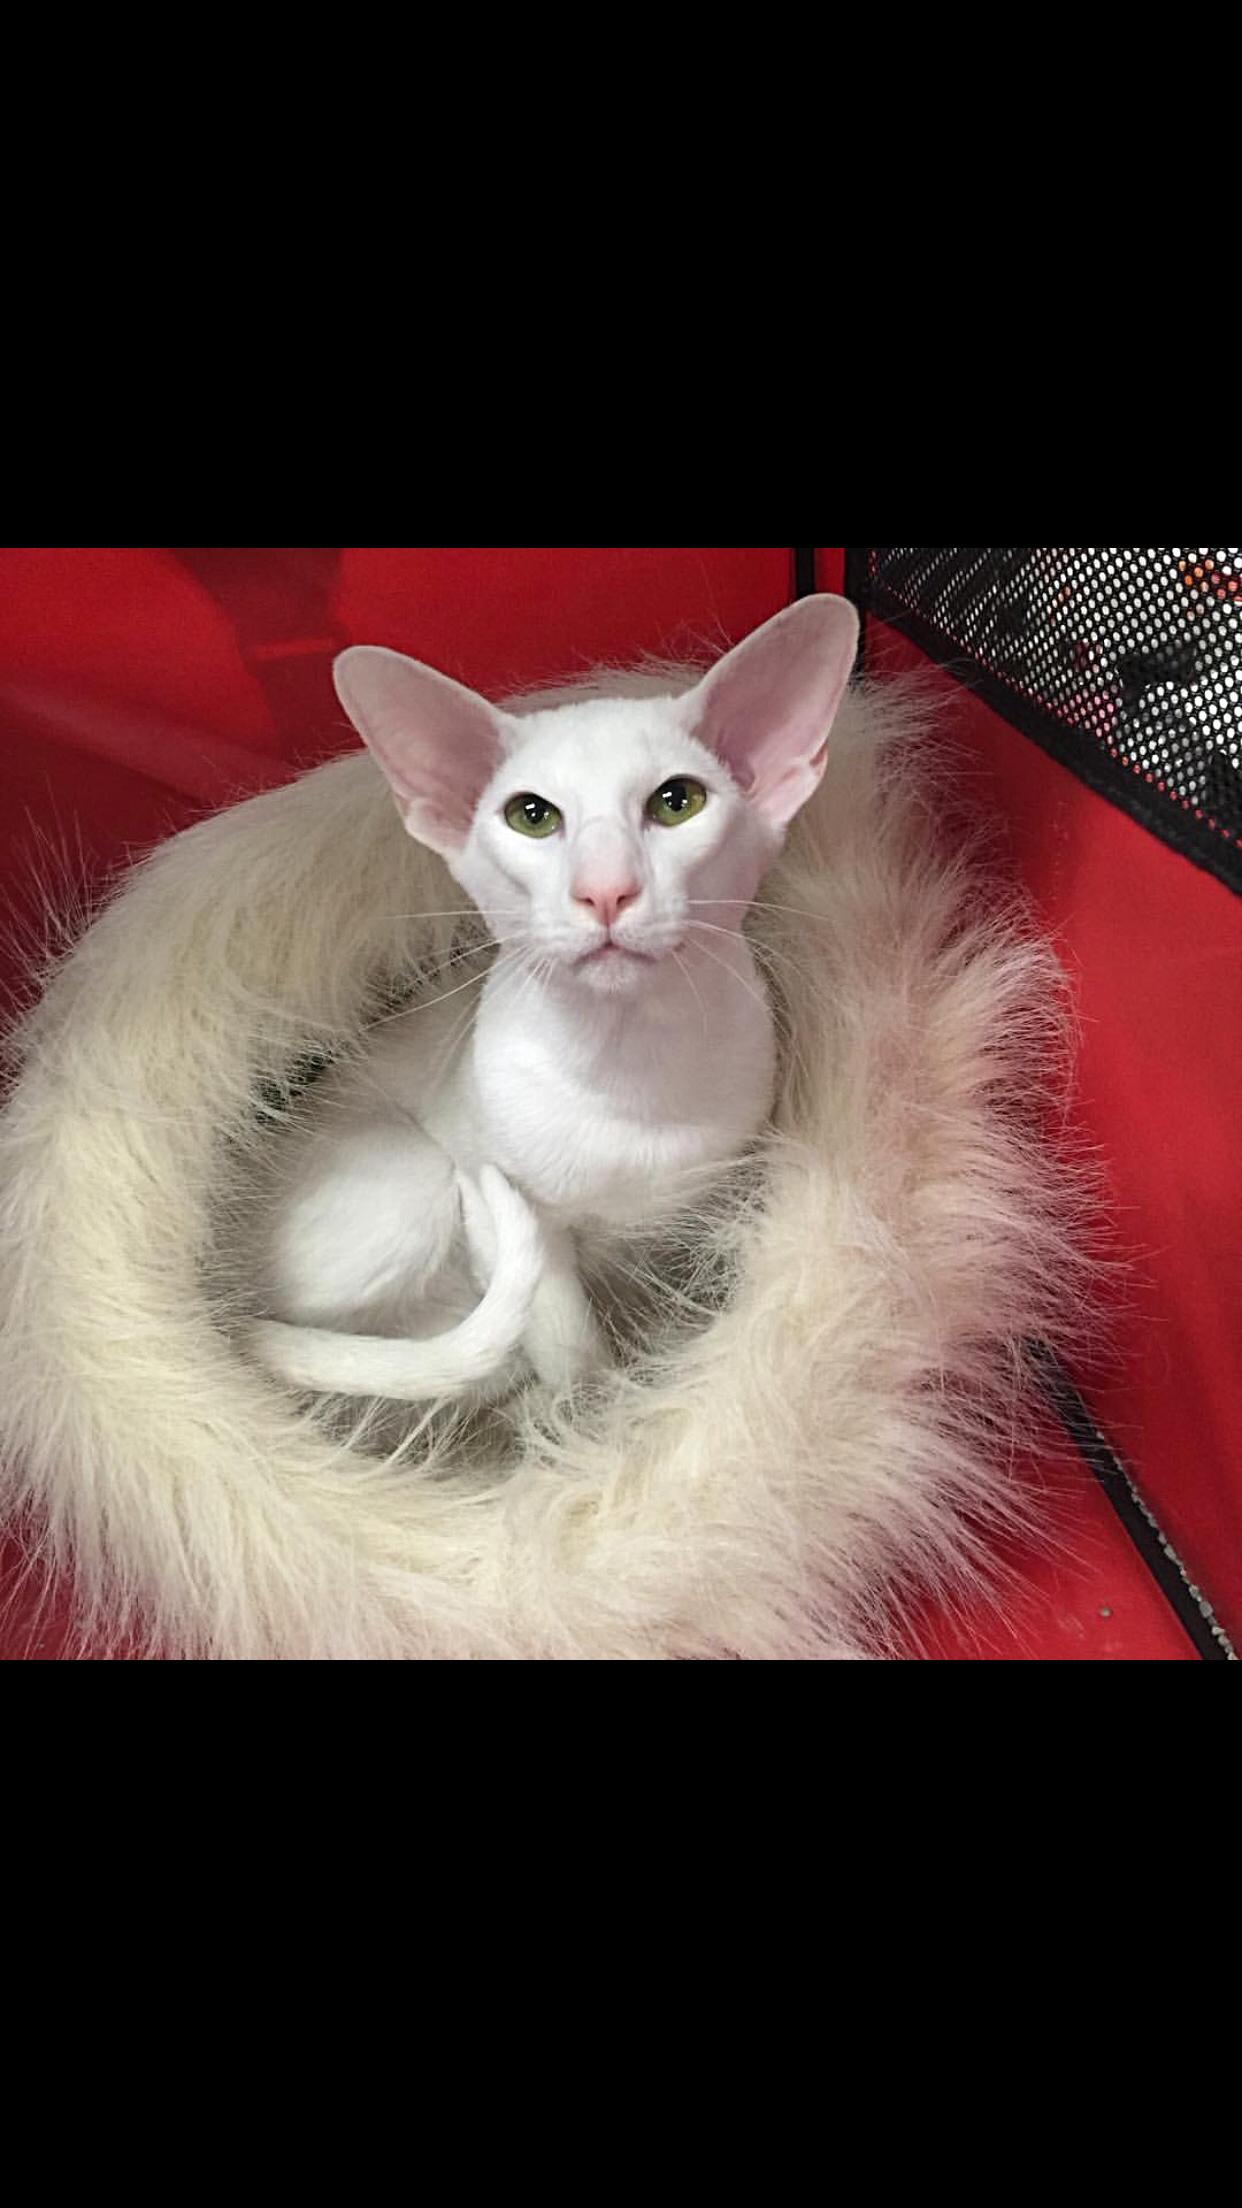 Yeti, white Oriental male Cattery, Animals, Cats